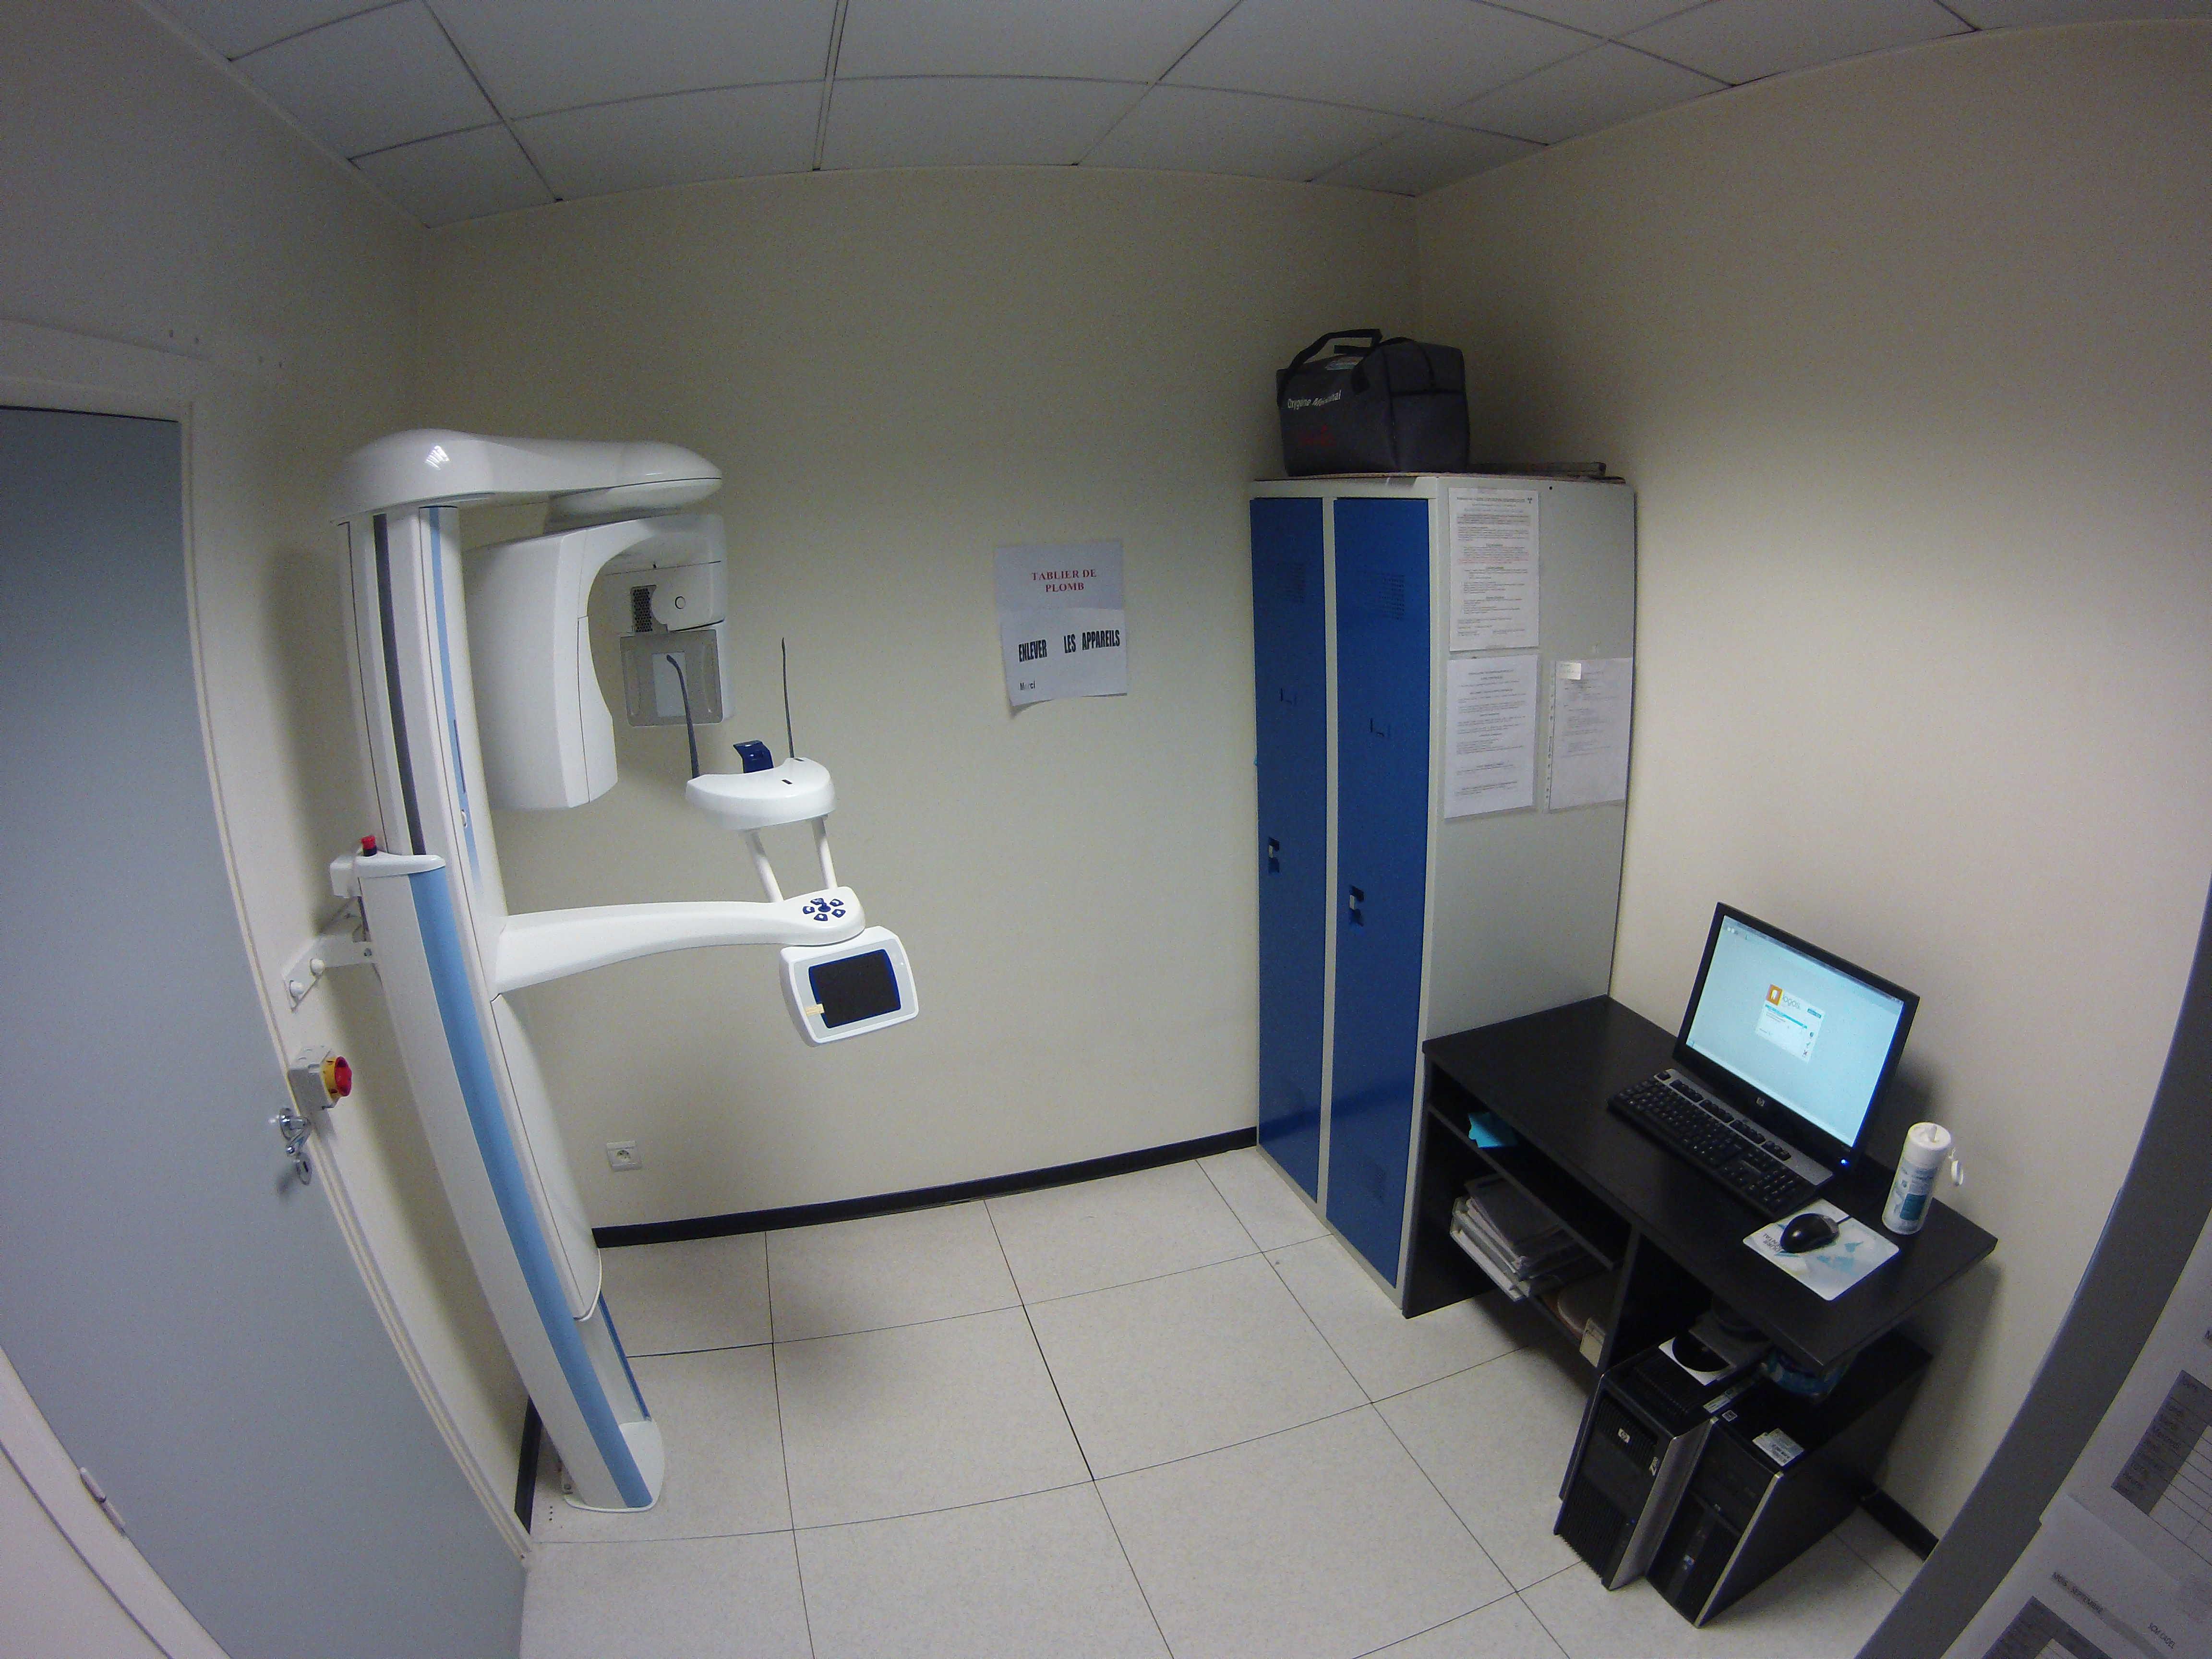 Cabinet de radiologie chambery - Cabinet de radiologie scanner ...